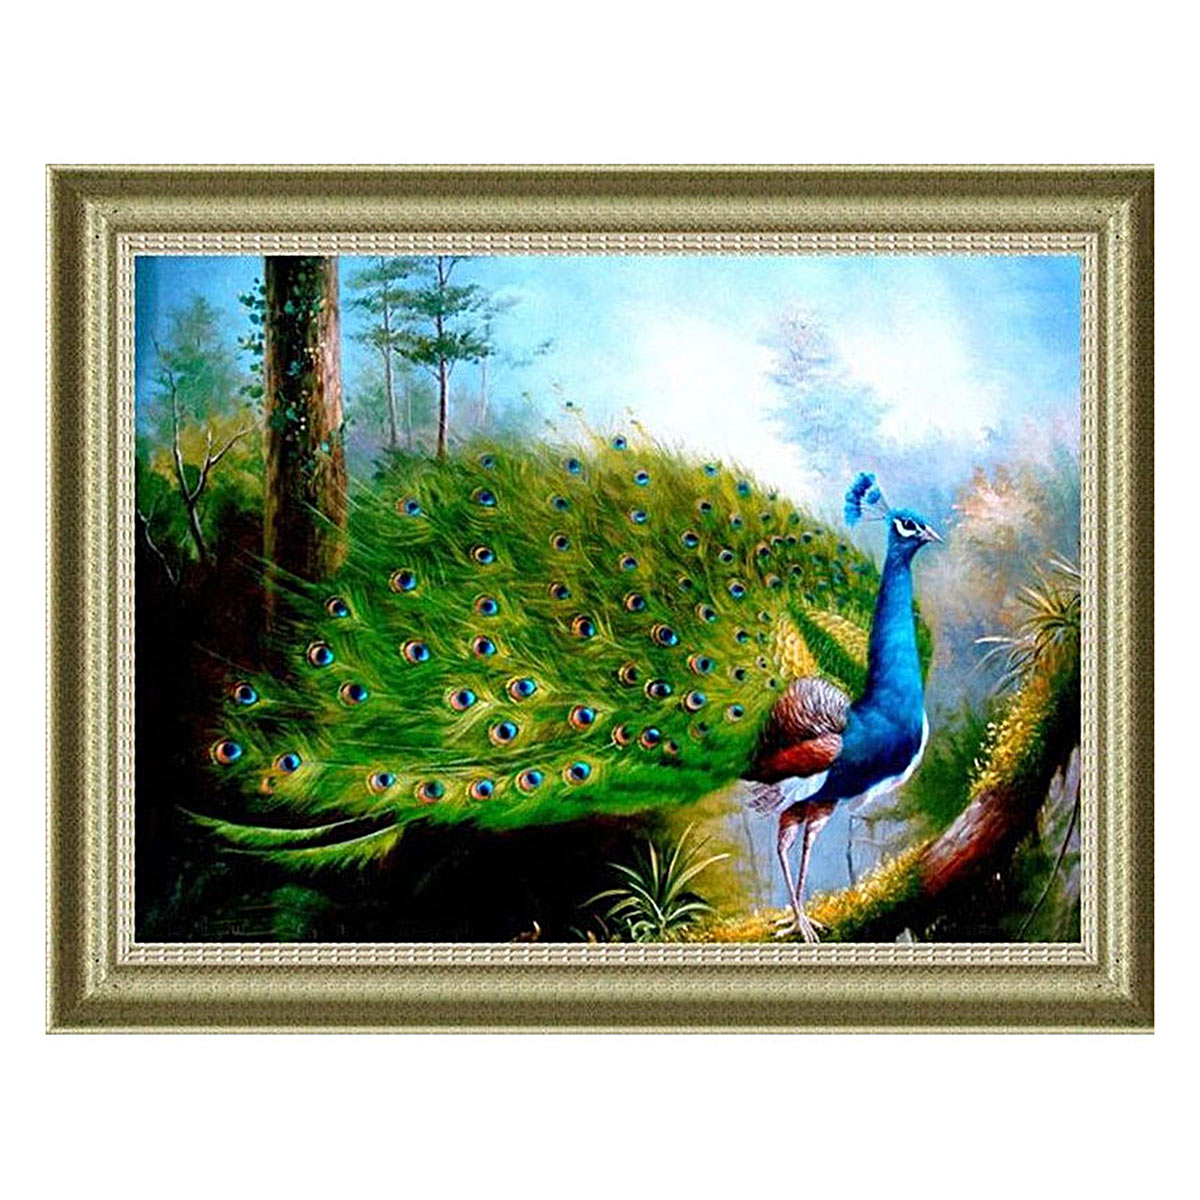 1027 Мозаика Cristal 'Гордый павлин', 65*43 см